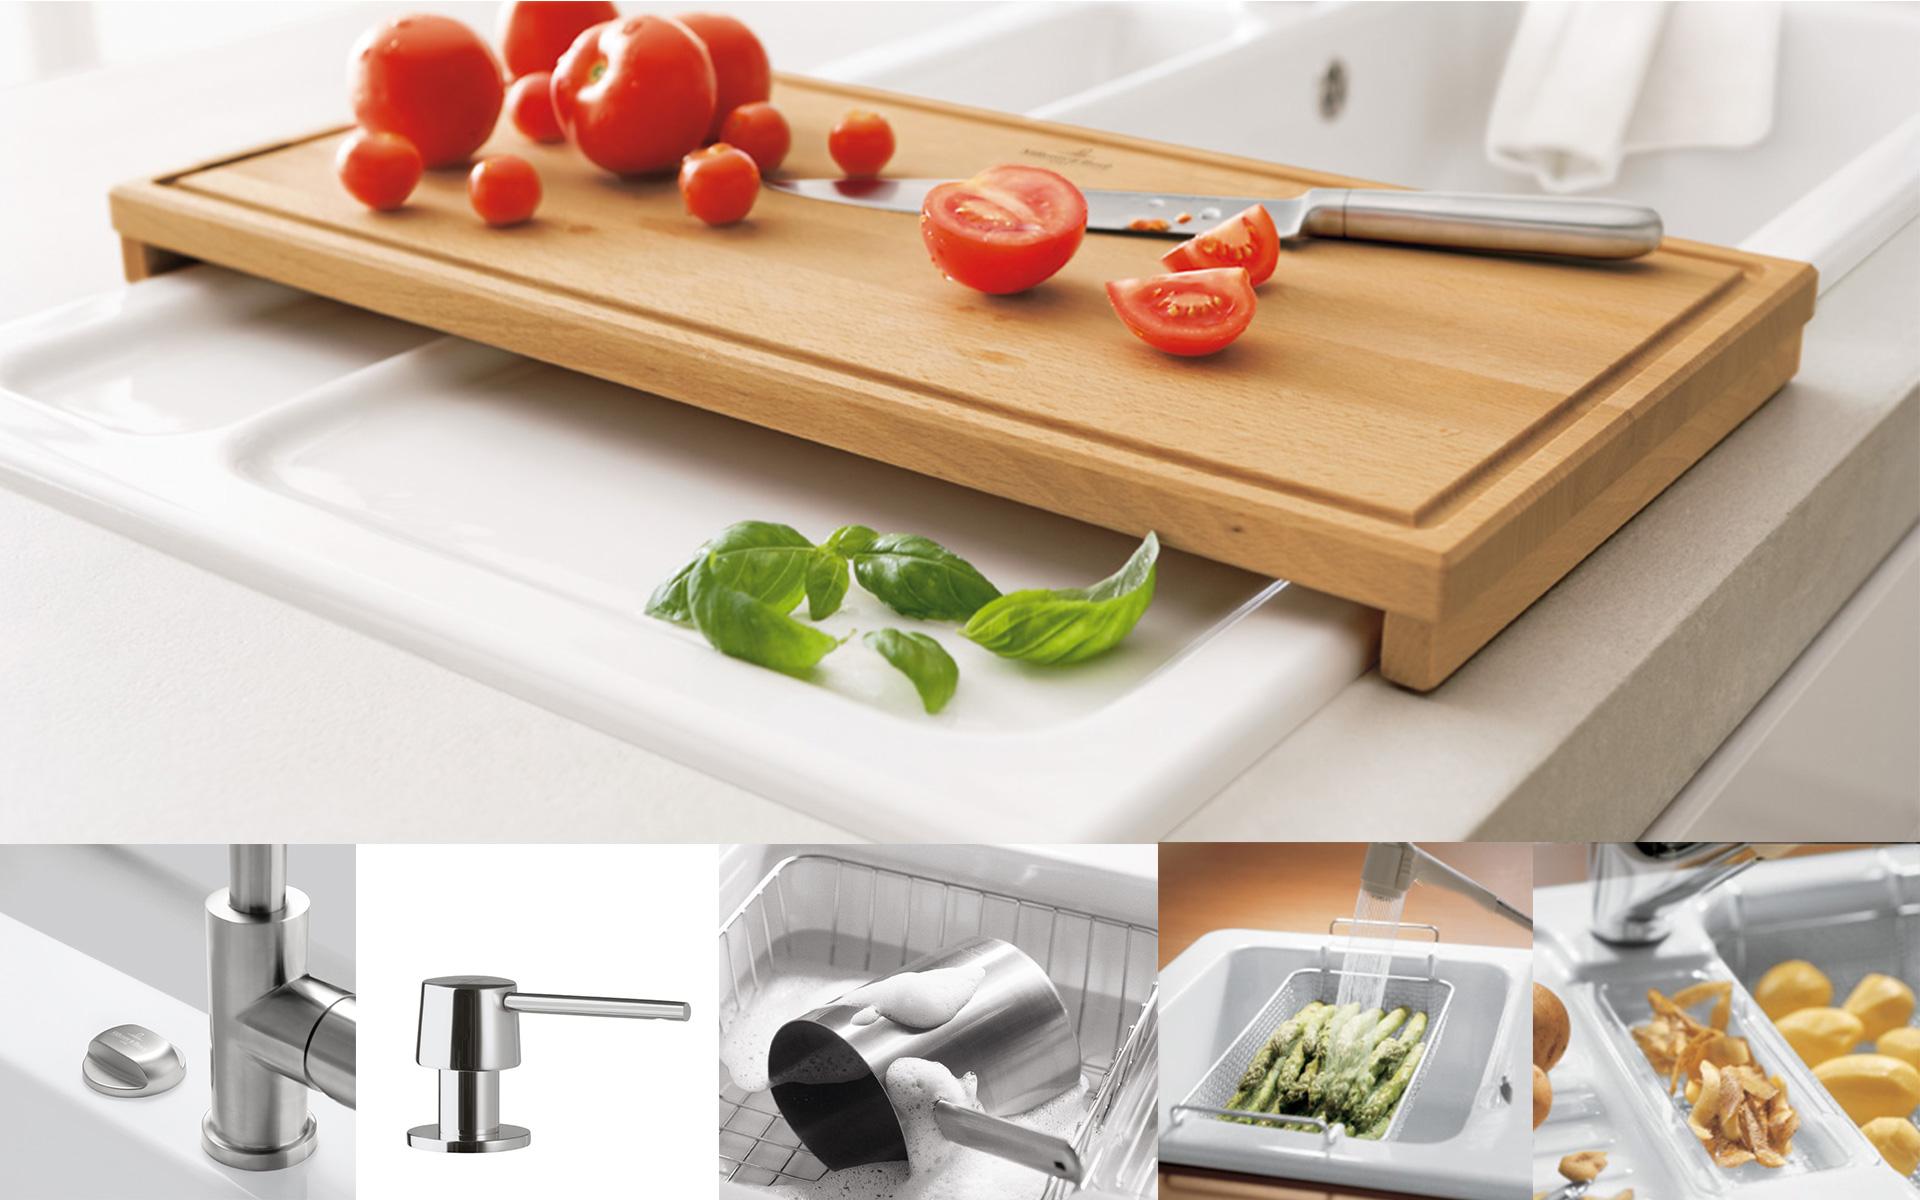 Accessori per la cucina Villeroy & Boch – Divertirsi in cucina